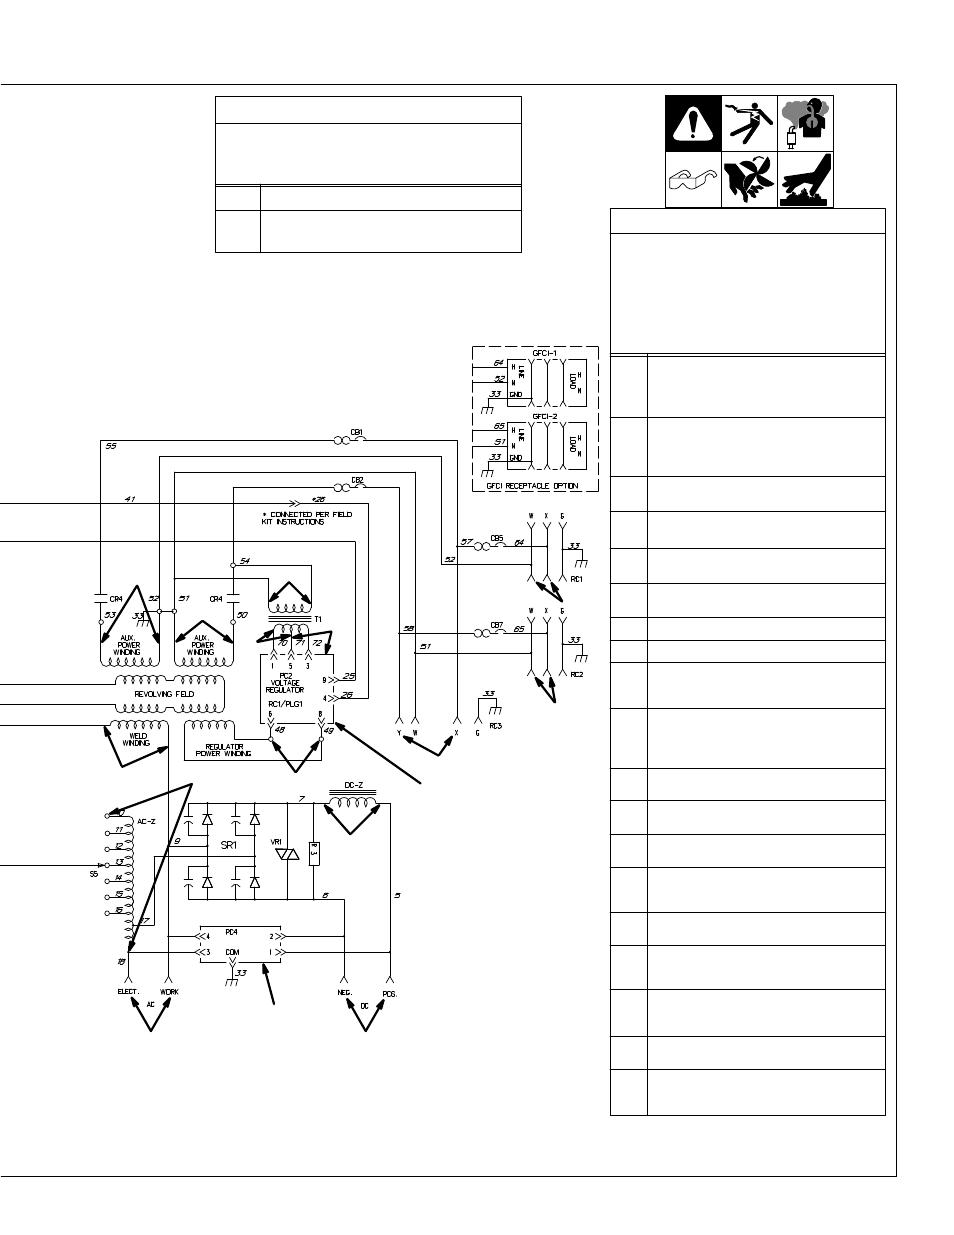 medium resolution of miller 200 welder wiring diagram for a wiring diagram 220v welder wiring diagram miller thunderbolt welder